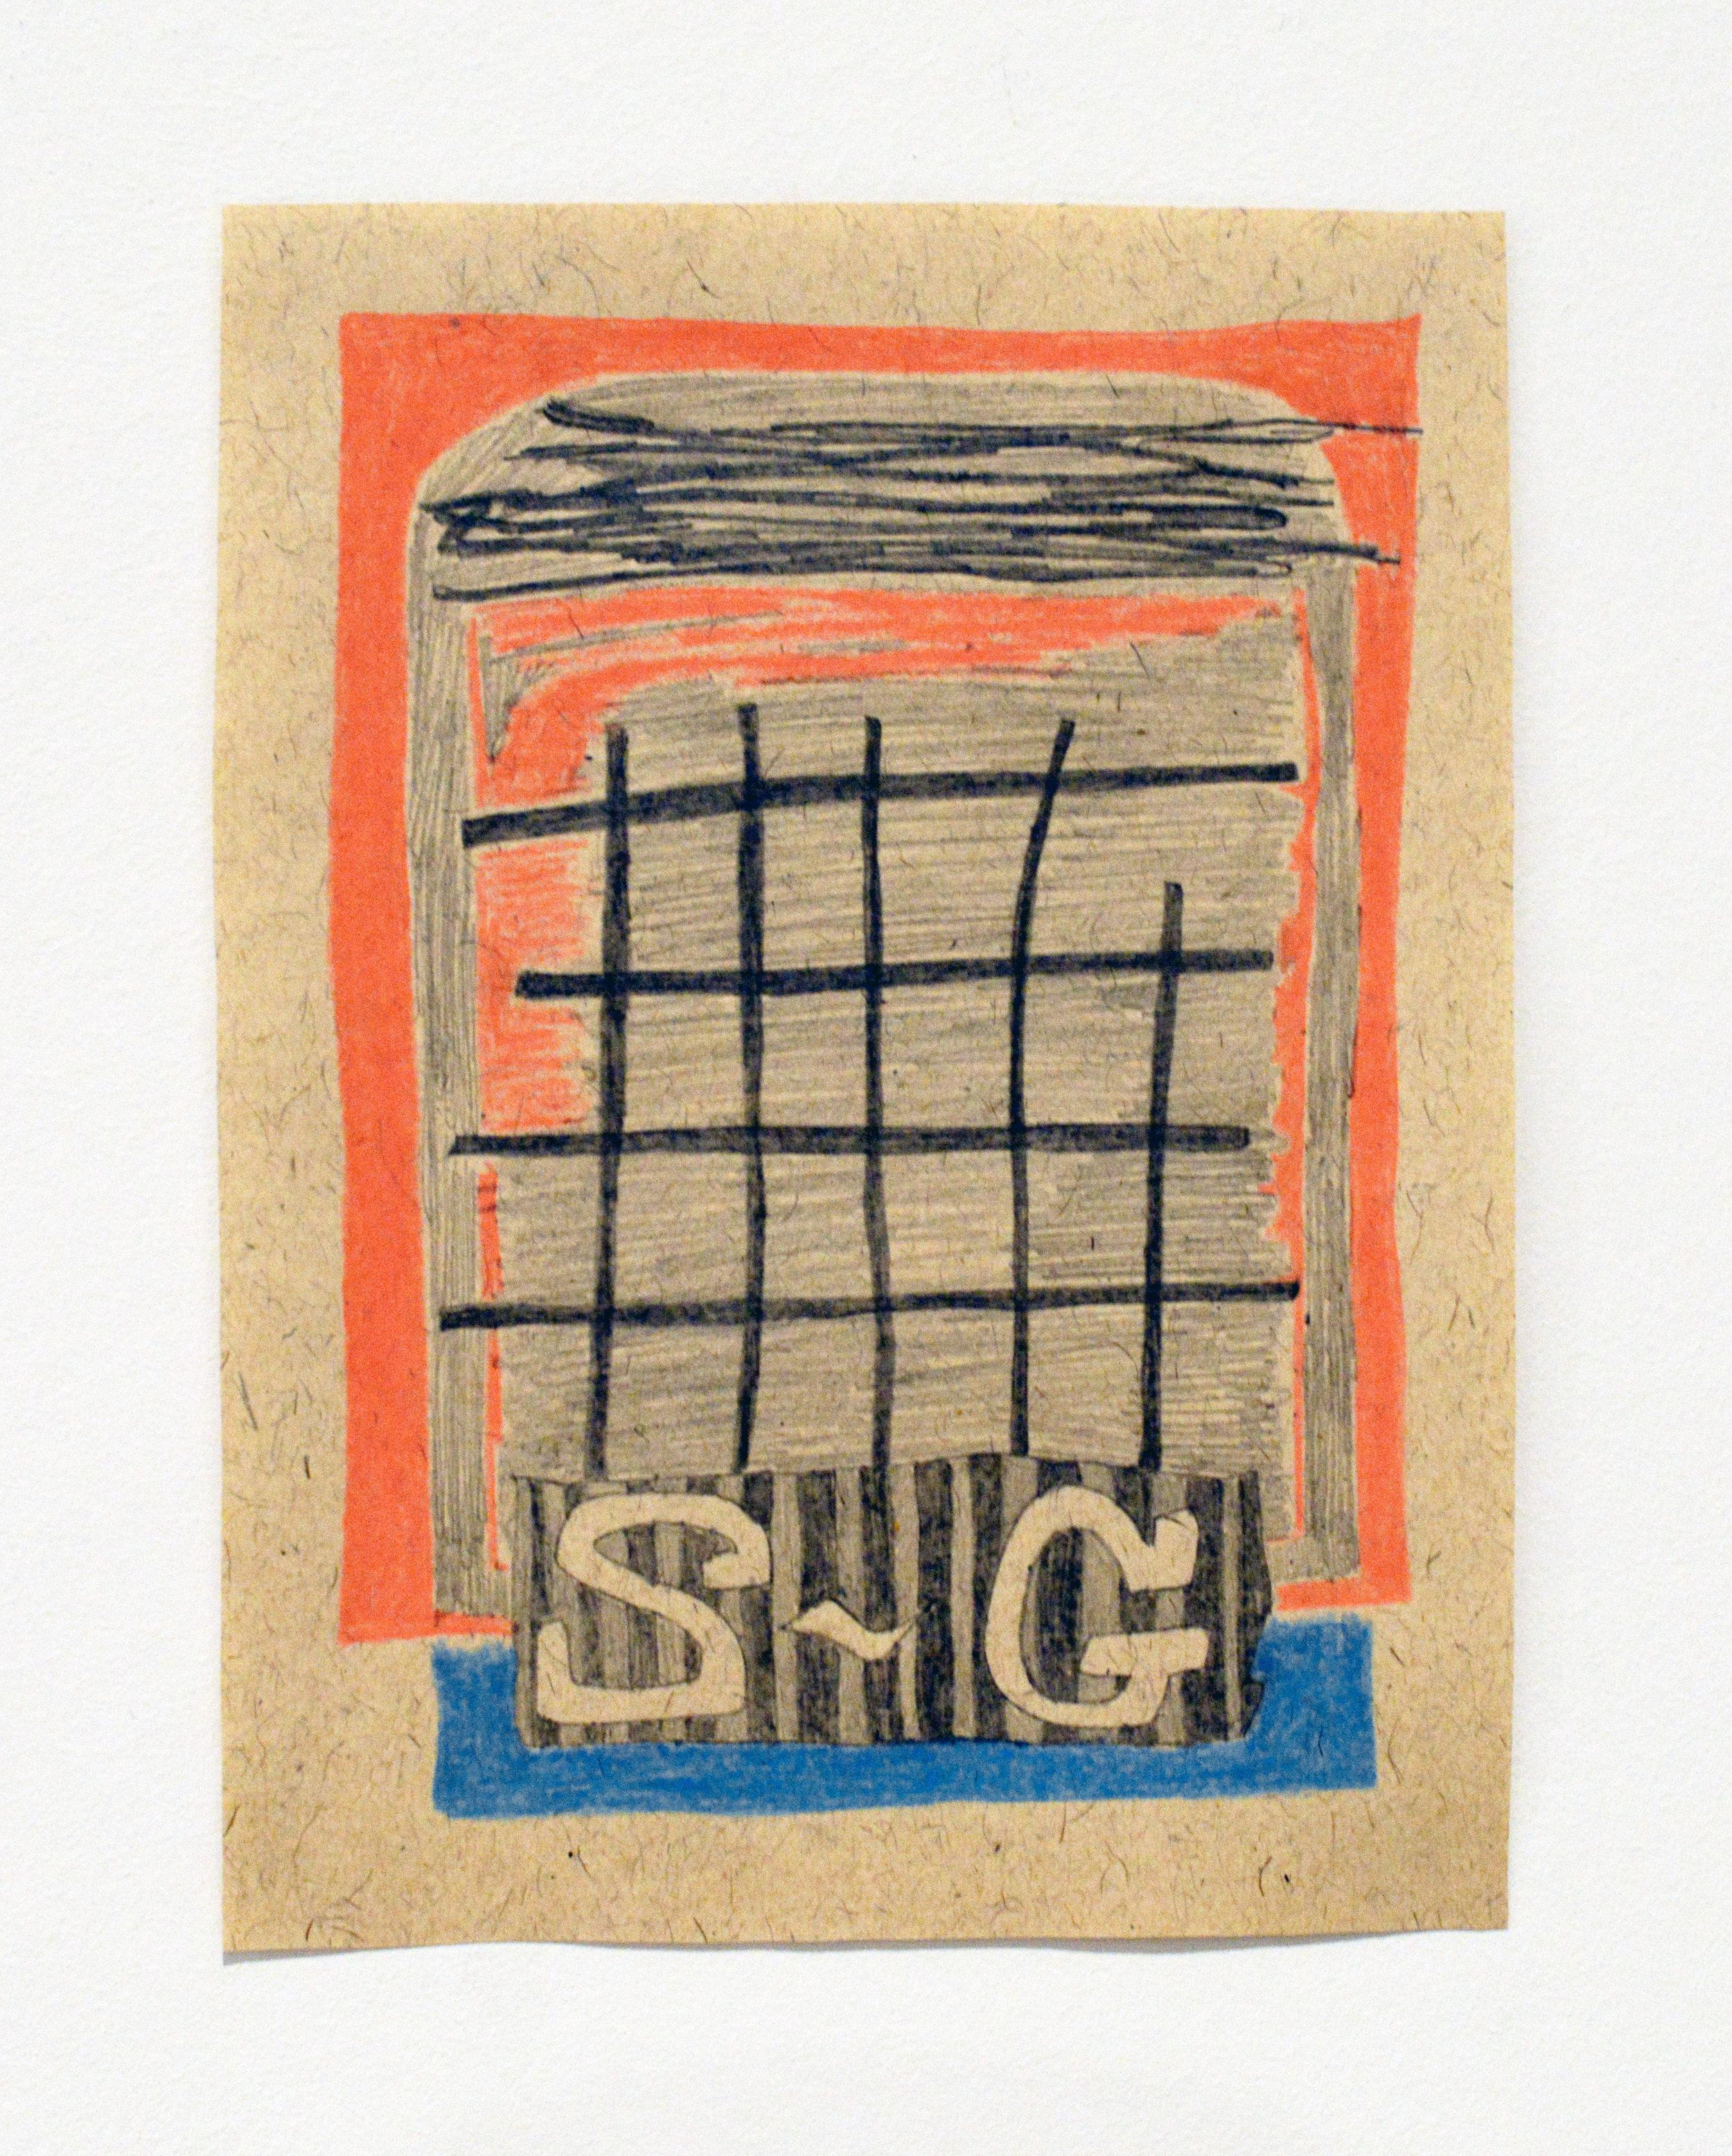 'Mix 4' - Pencil on handmade cotton rag paper - 17,5 x 13 cm - 2017